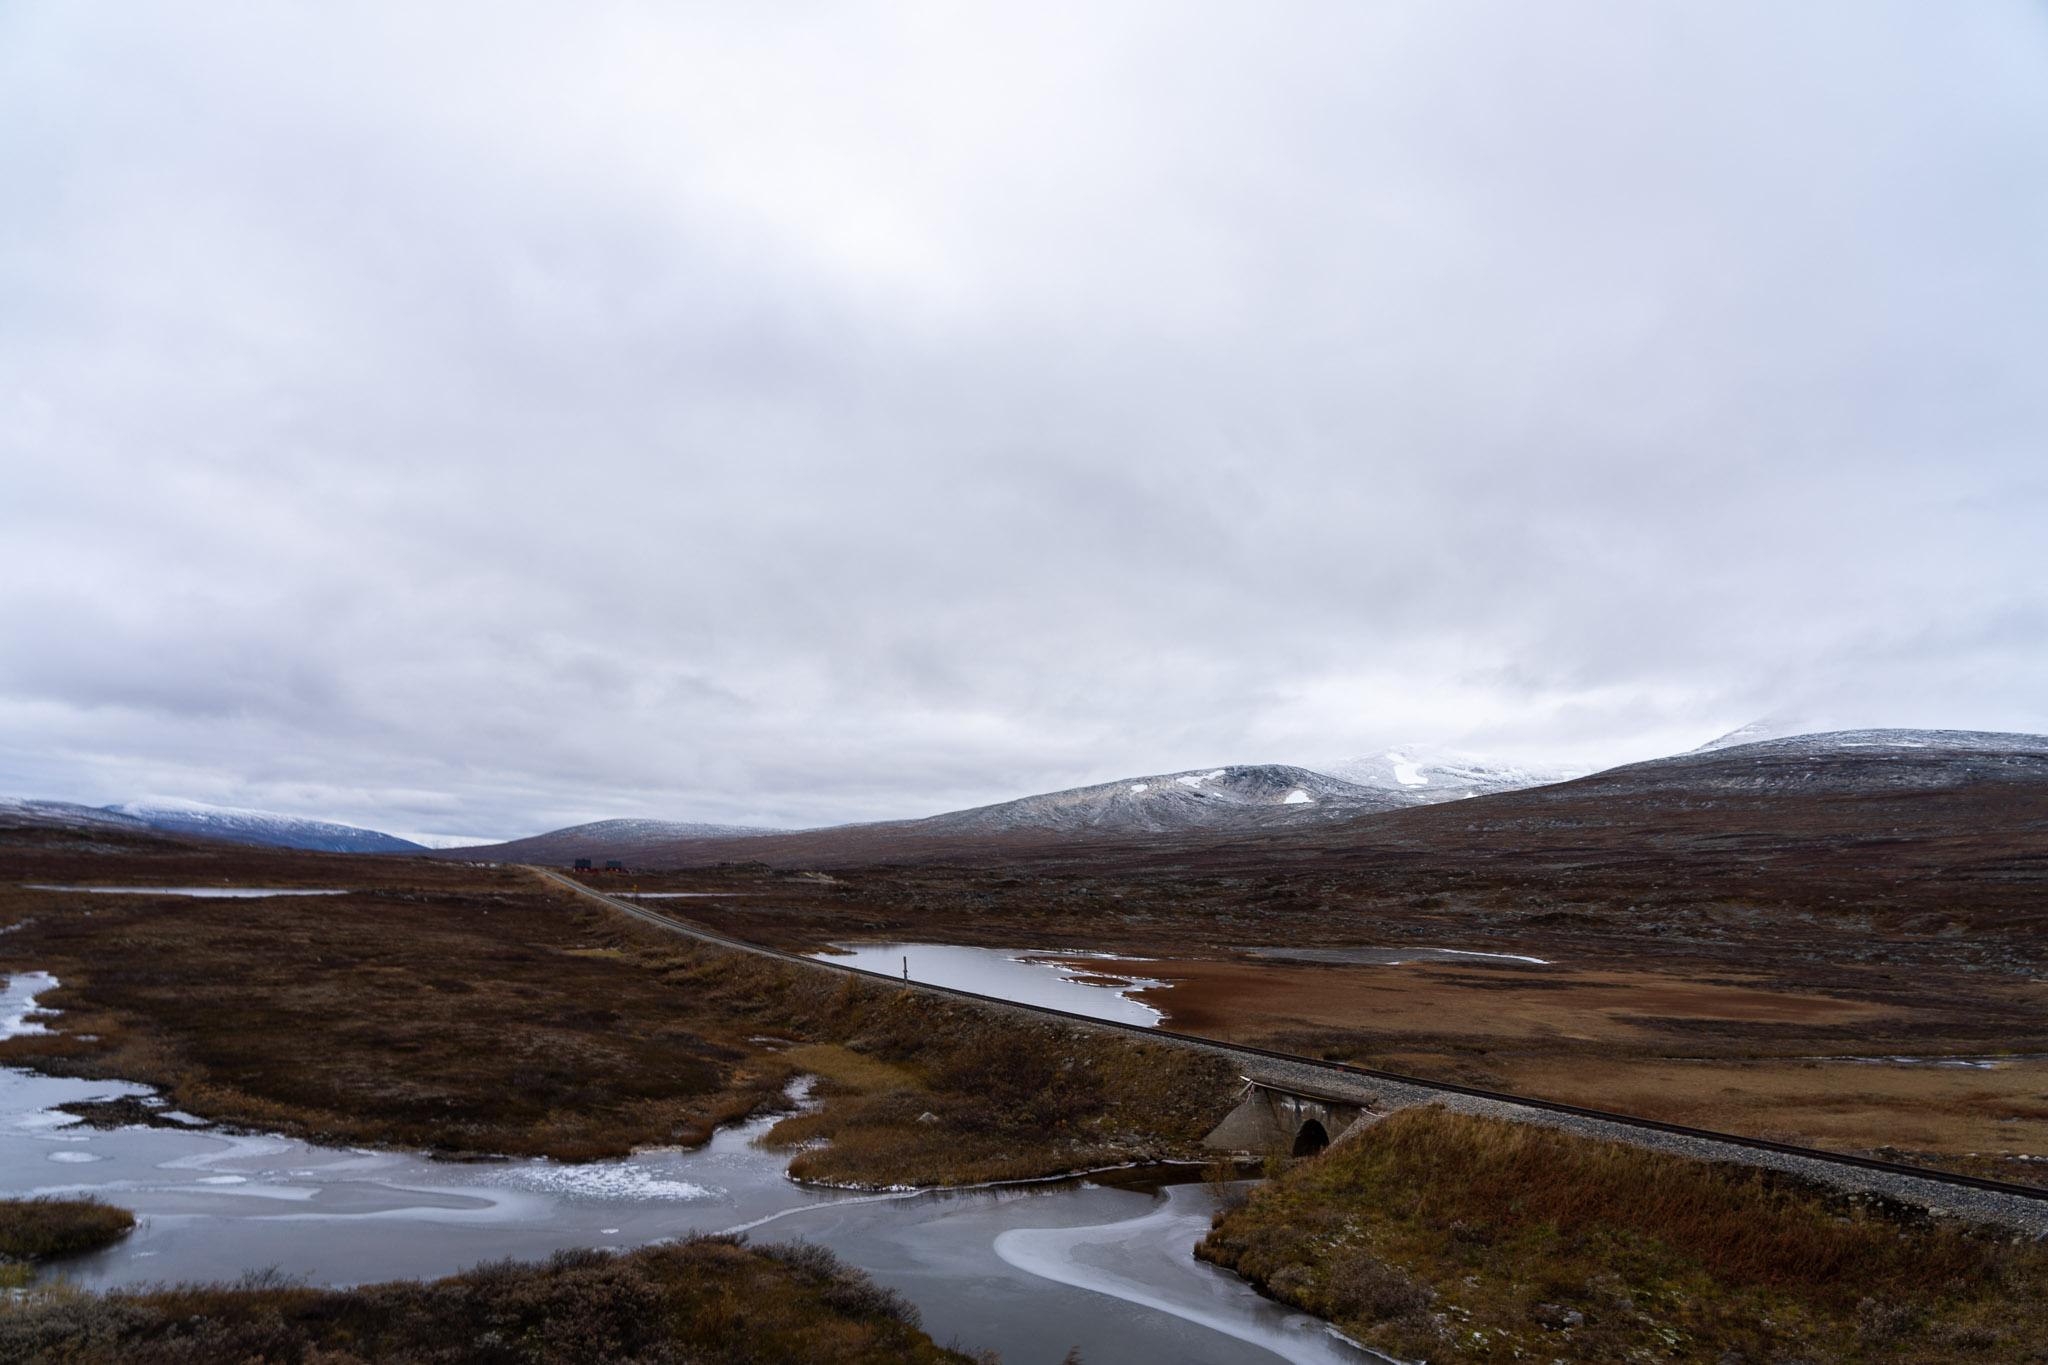 Zugefrorene Seen